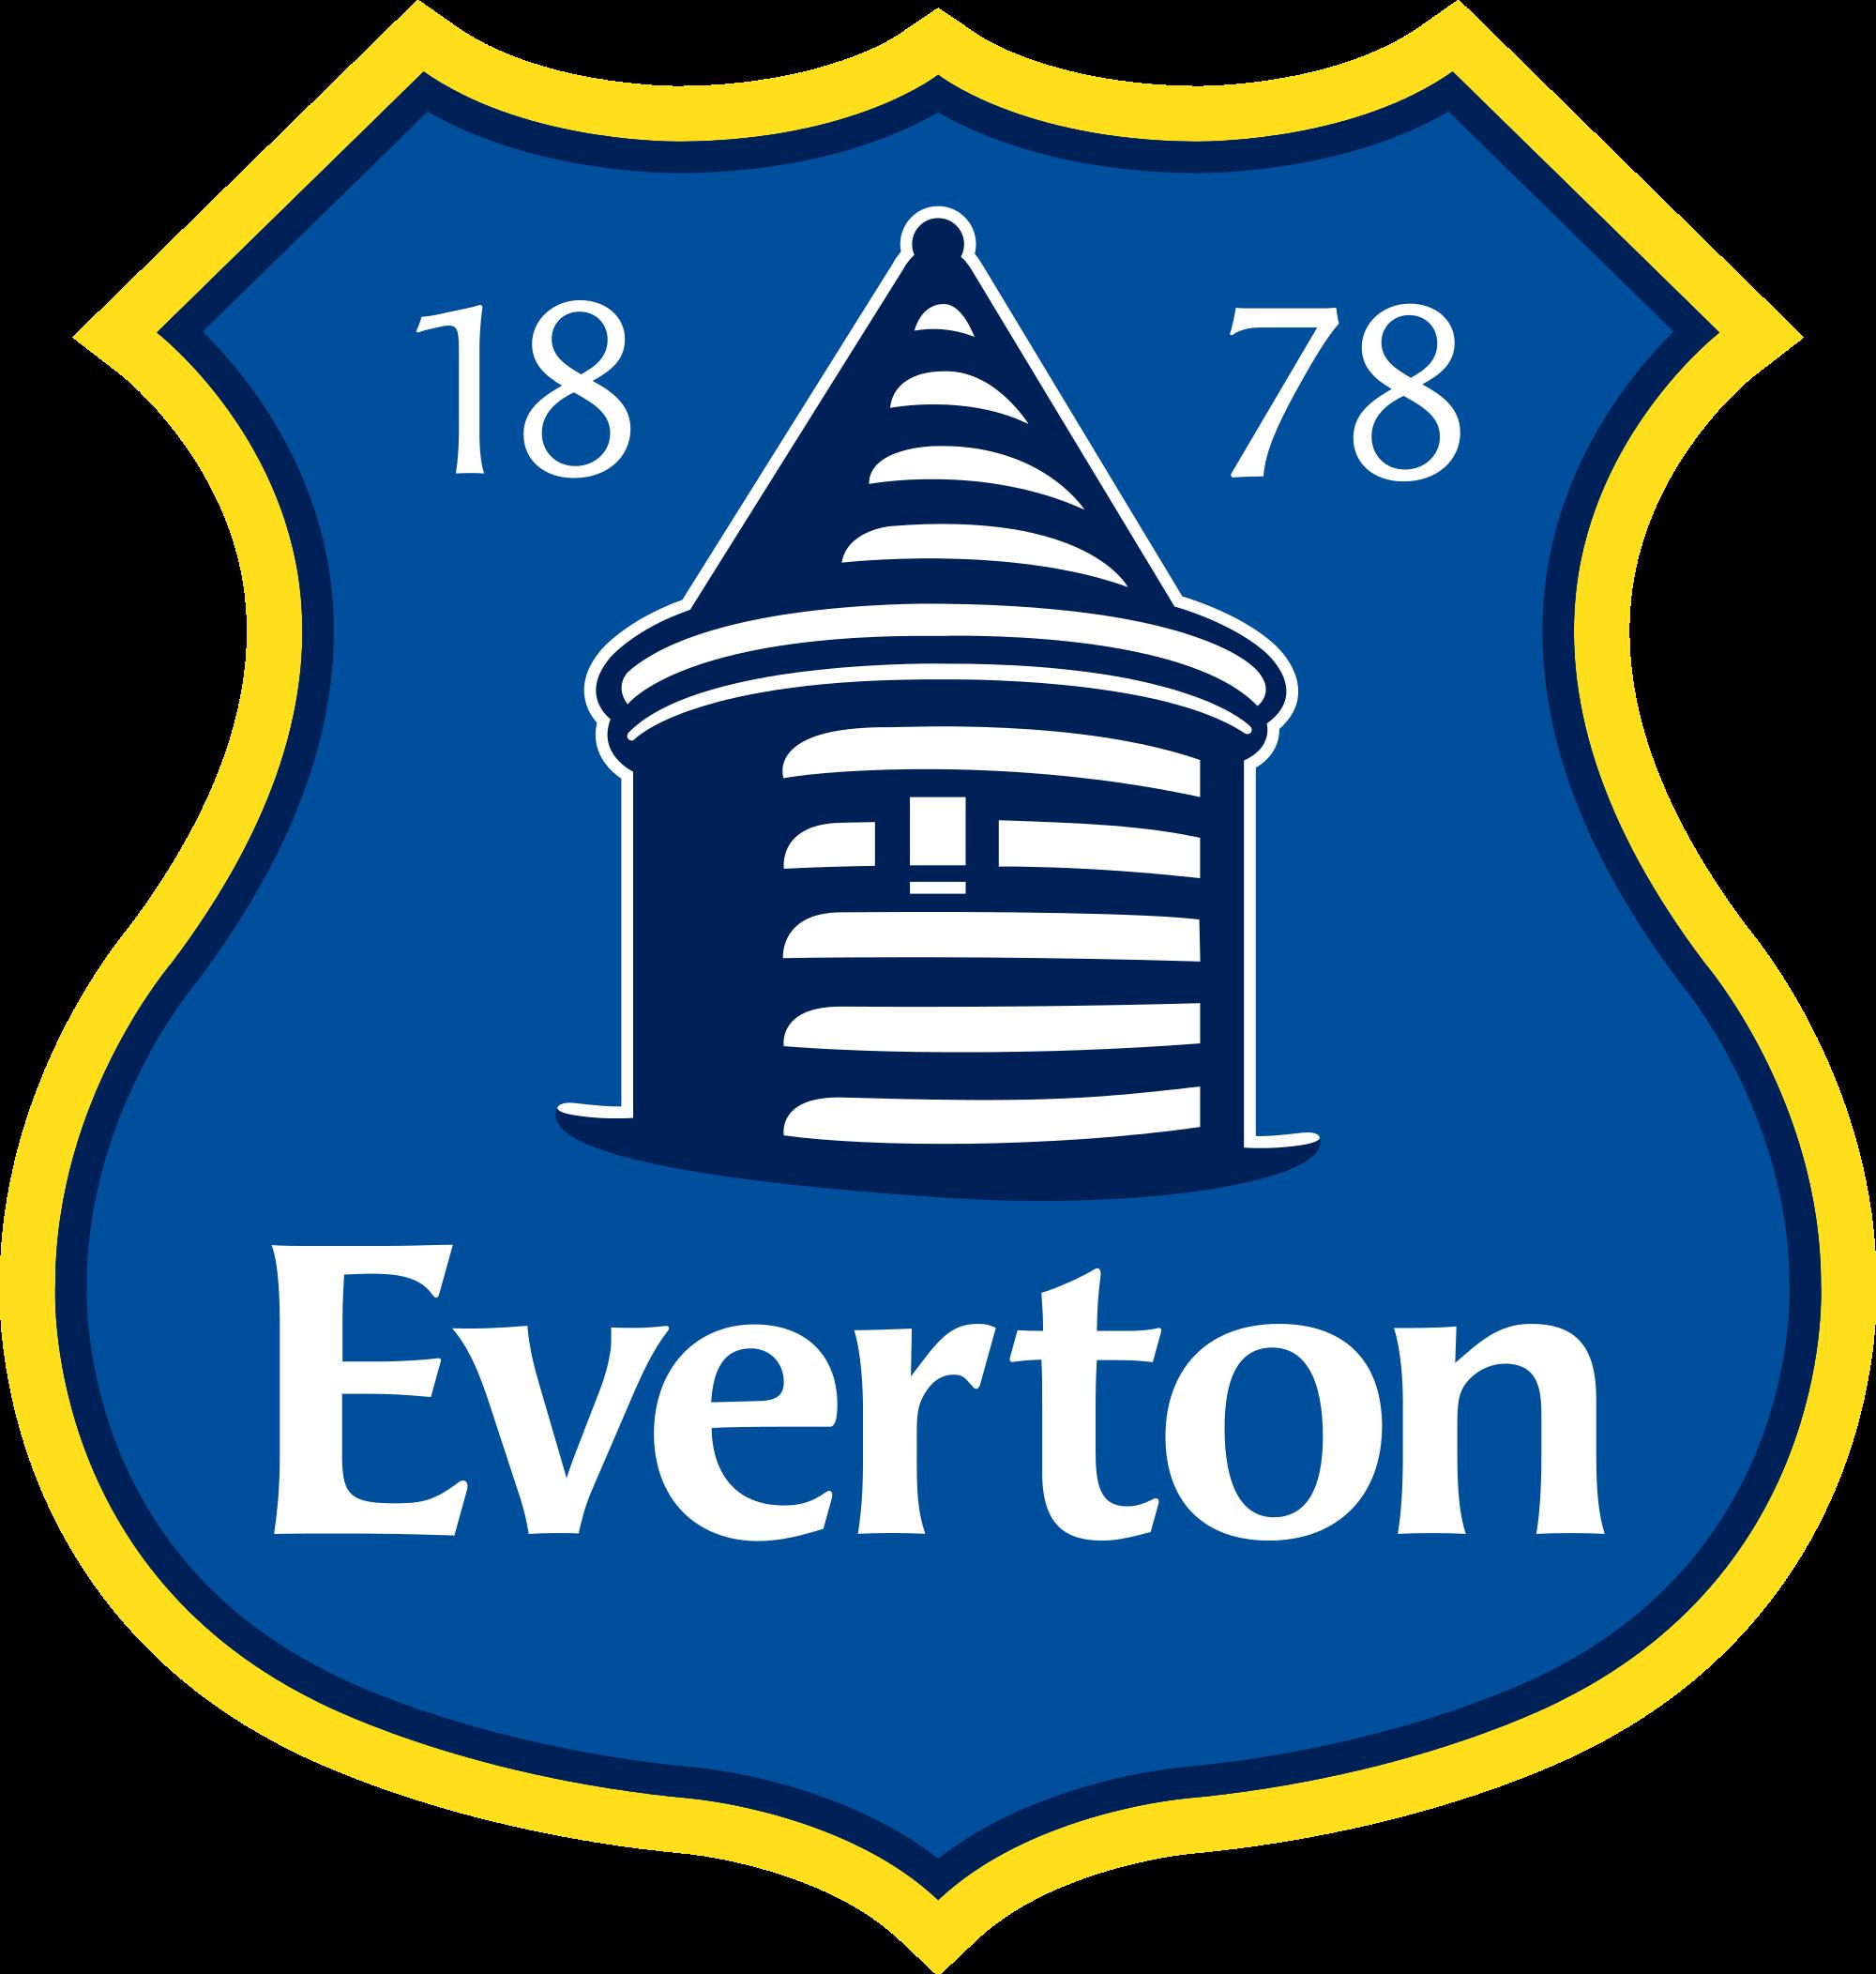 Everton football club everton fc logos and premier league